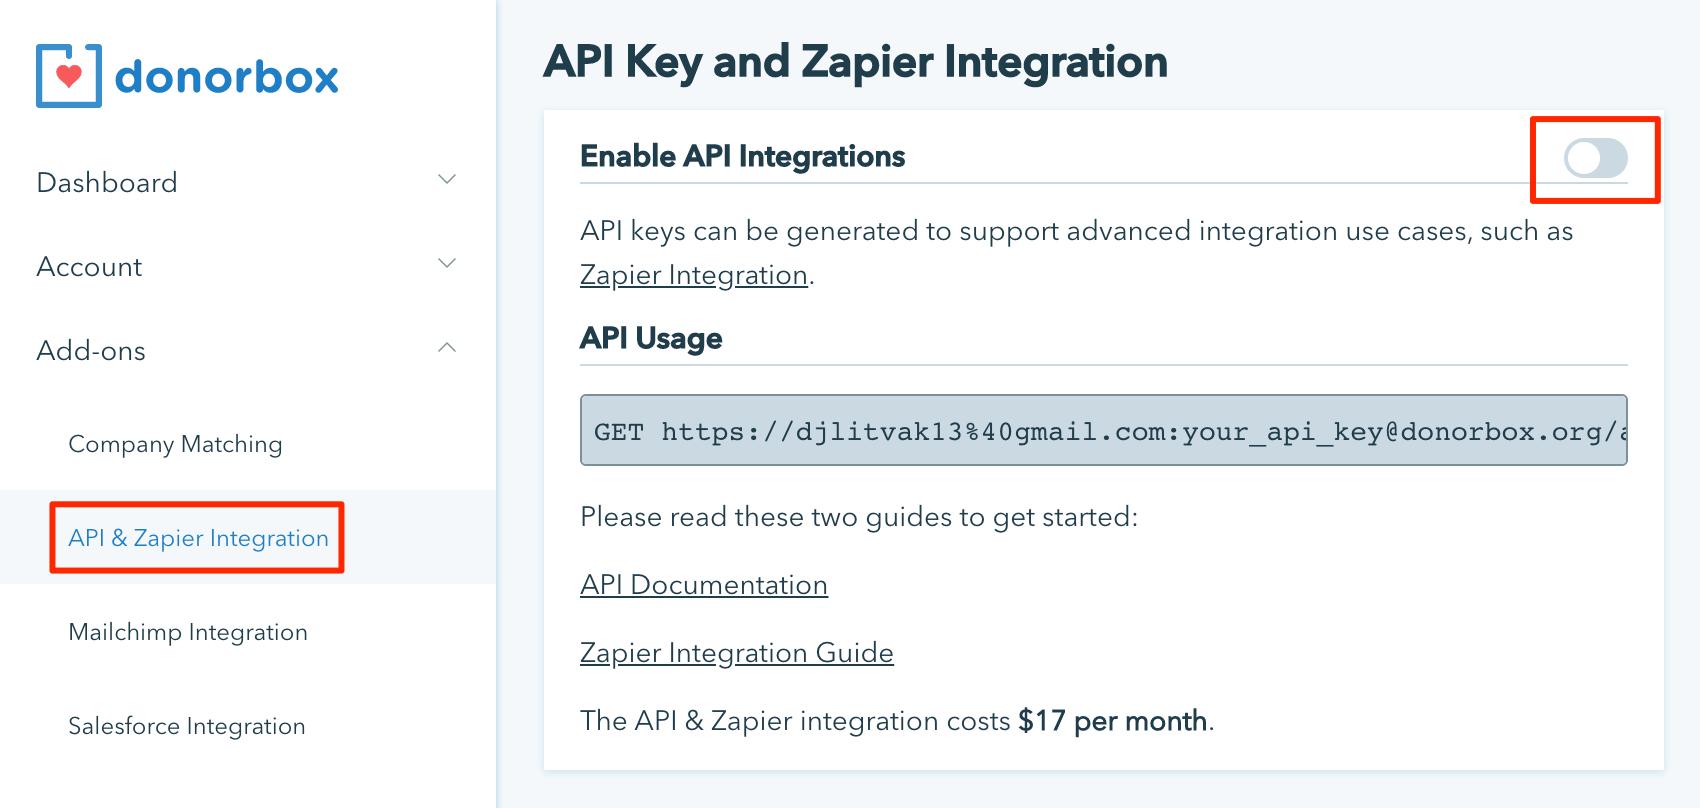 Enabling Zapier/API integration in account